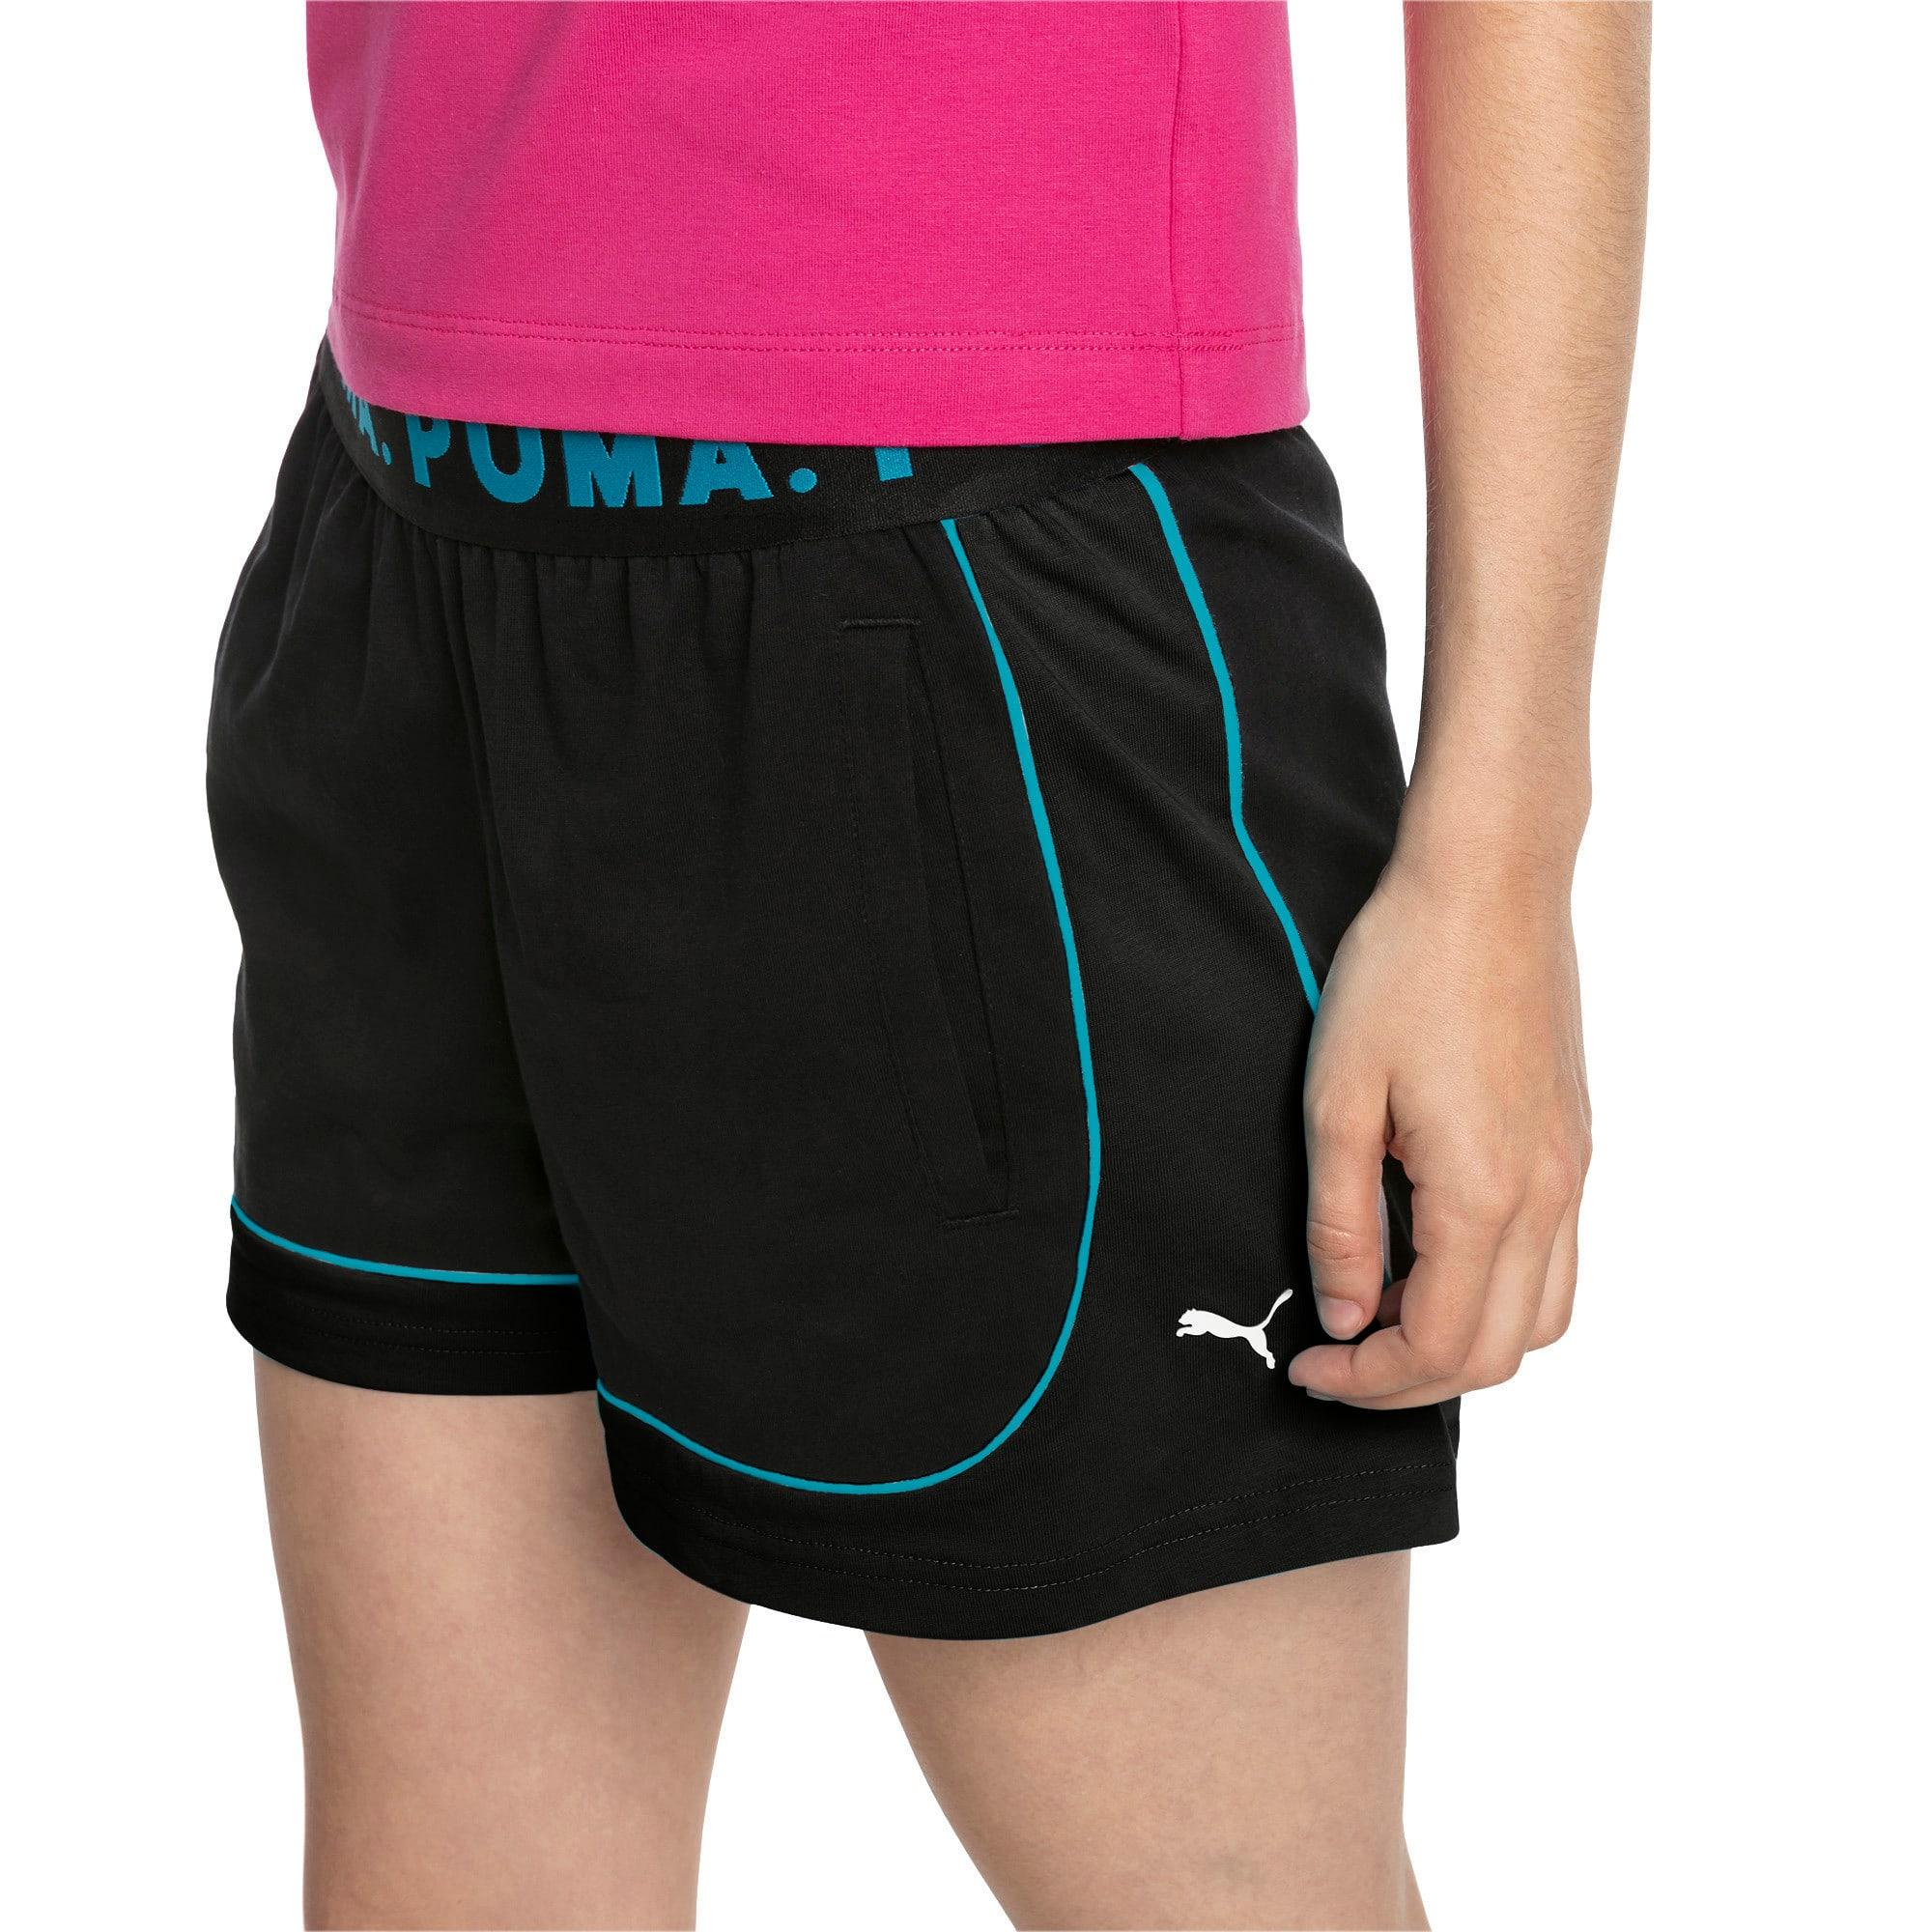 Thumbnail 1 of Chase Women's Shorts, Cotton Black-Caribbean Sea, medium